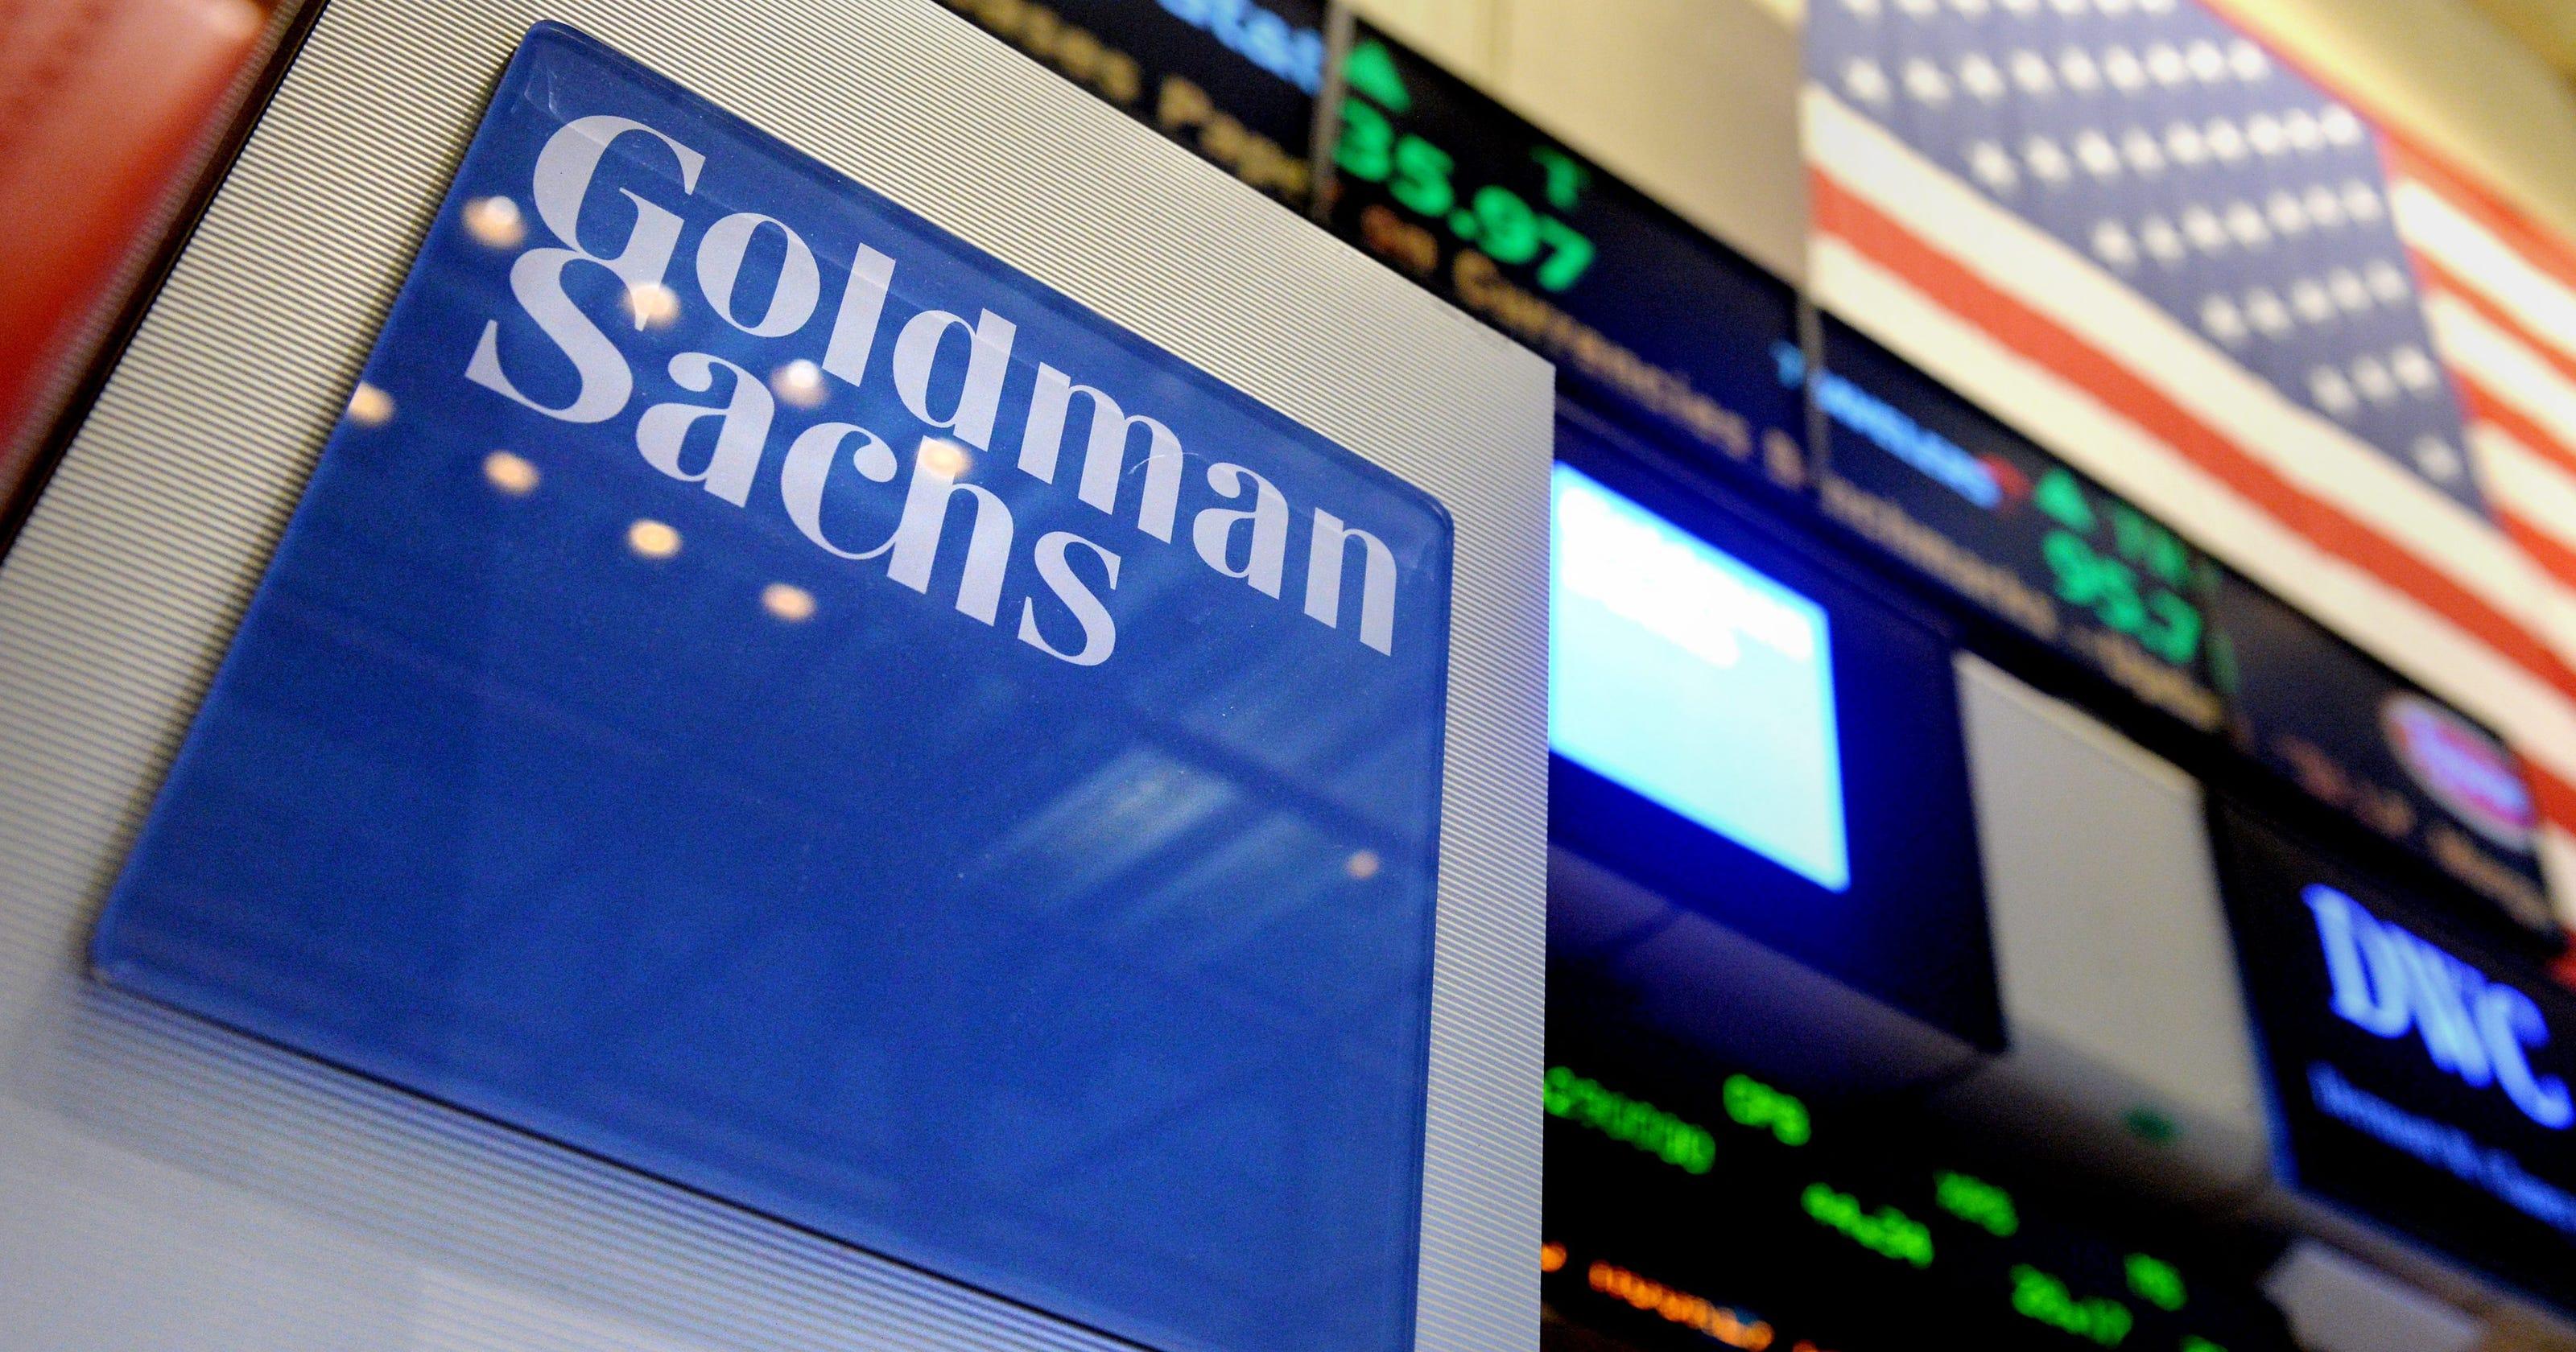 Goldman Sachs Q1 net income down 60% as banking, trading